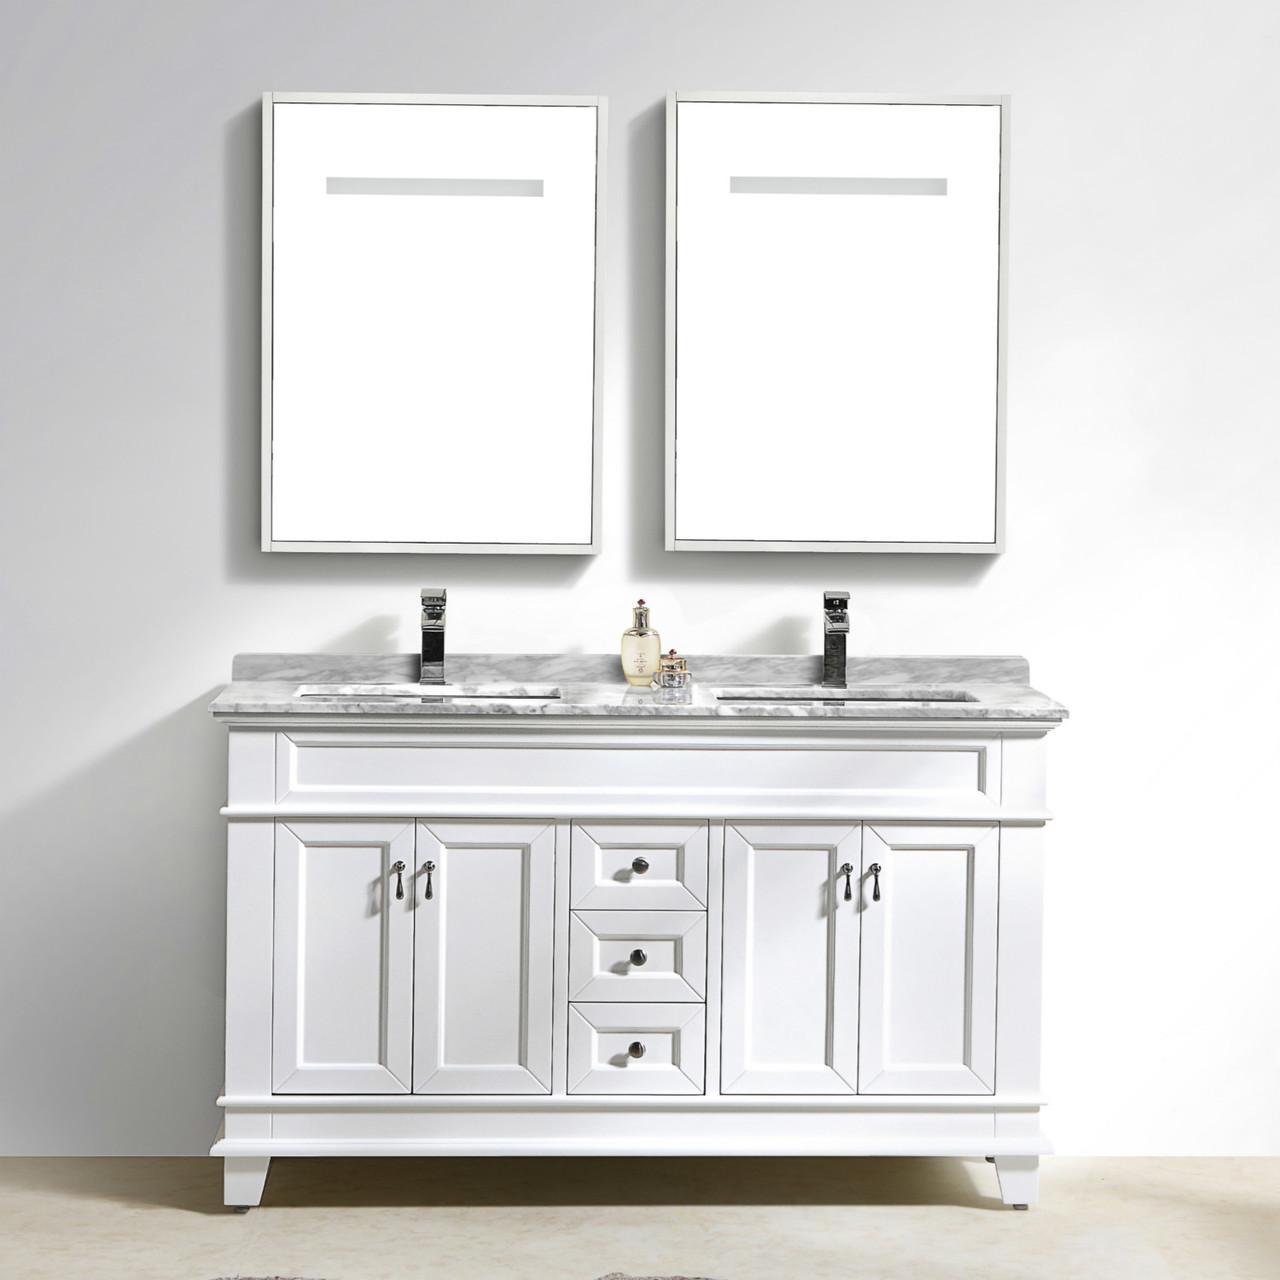 White Bathroom Vanity on white bathroom vanity 30, white wood bathroom vanity, white single bathroom vanity, 48 white bathroom vanity, white modern bathroom vanity, 36 white bathroom vanity, white marble bathroom vanity, white antique bathroom vanity, white cottage bathroom vanity, white 72 bathroom vanity, 24 white bathroom vanity,